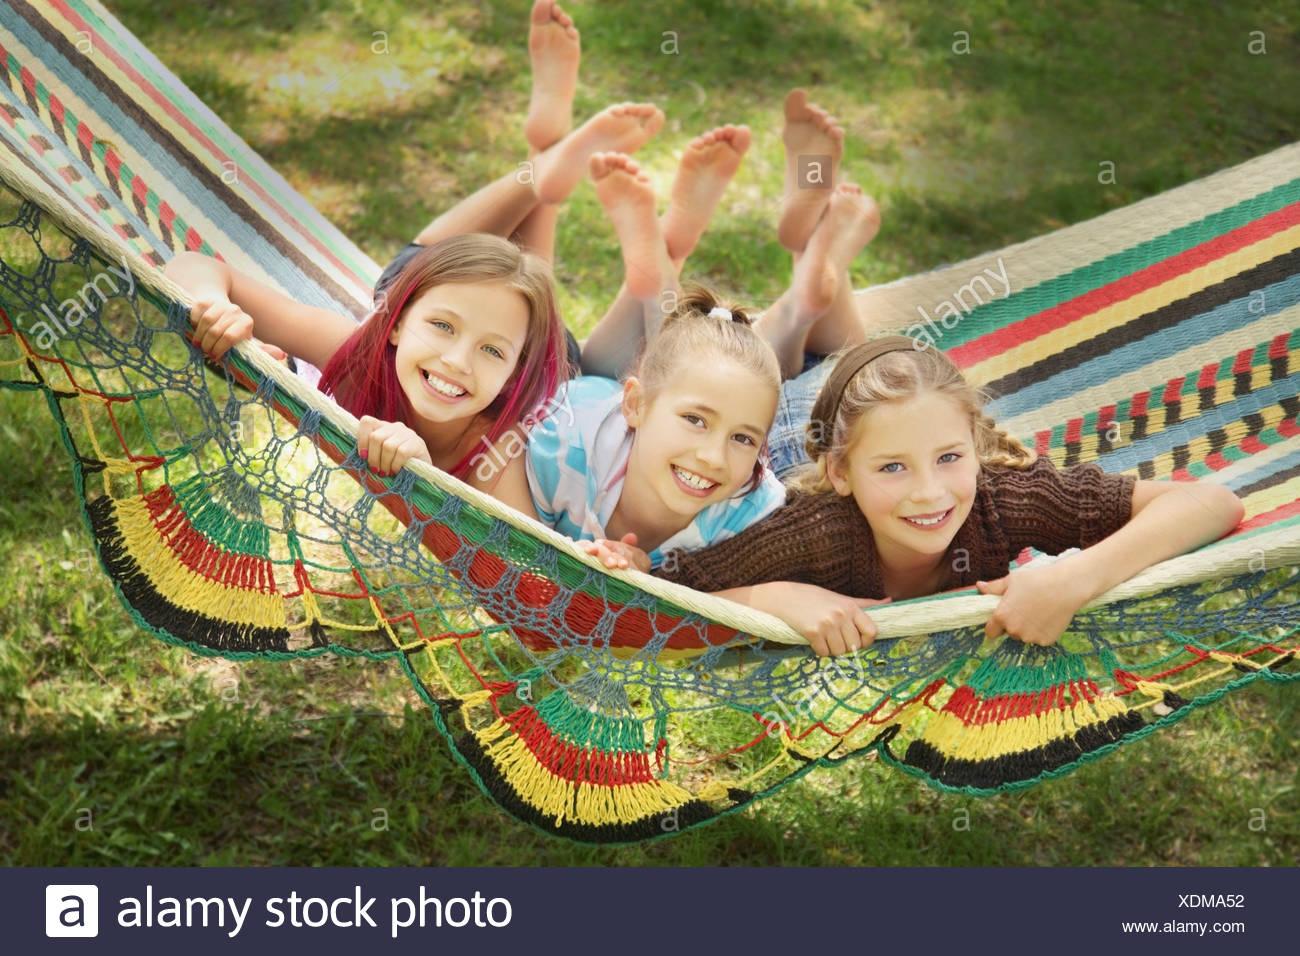 Edmonton, Alberta, Canada; Three Girls Laying In A Hammock - Stock Image